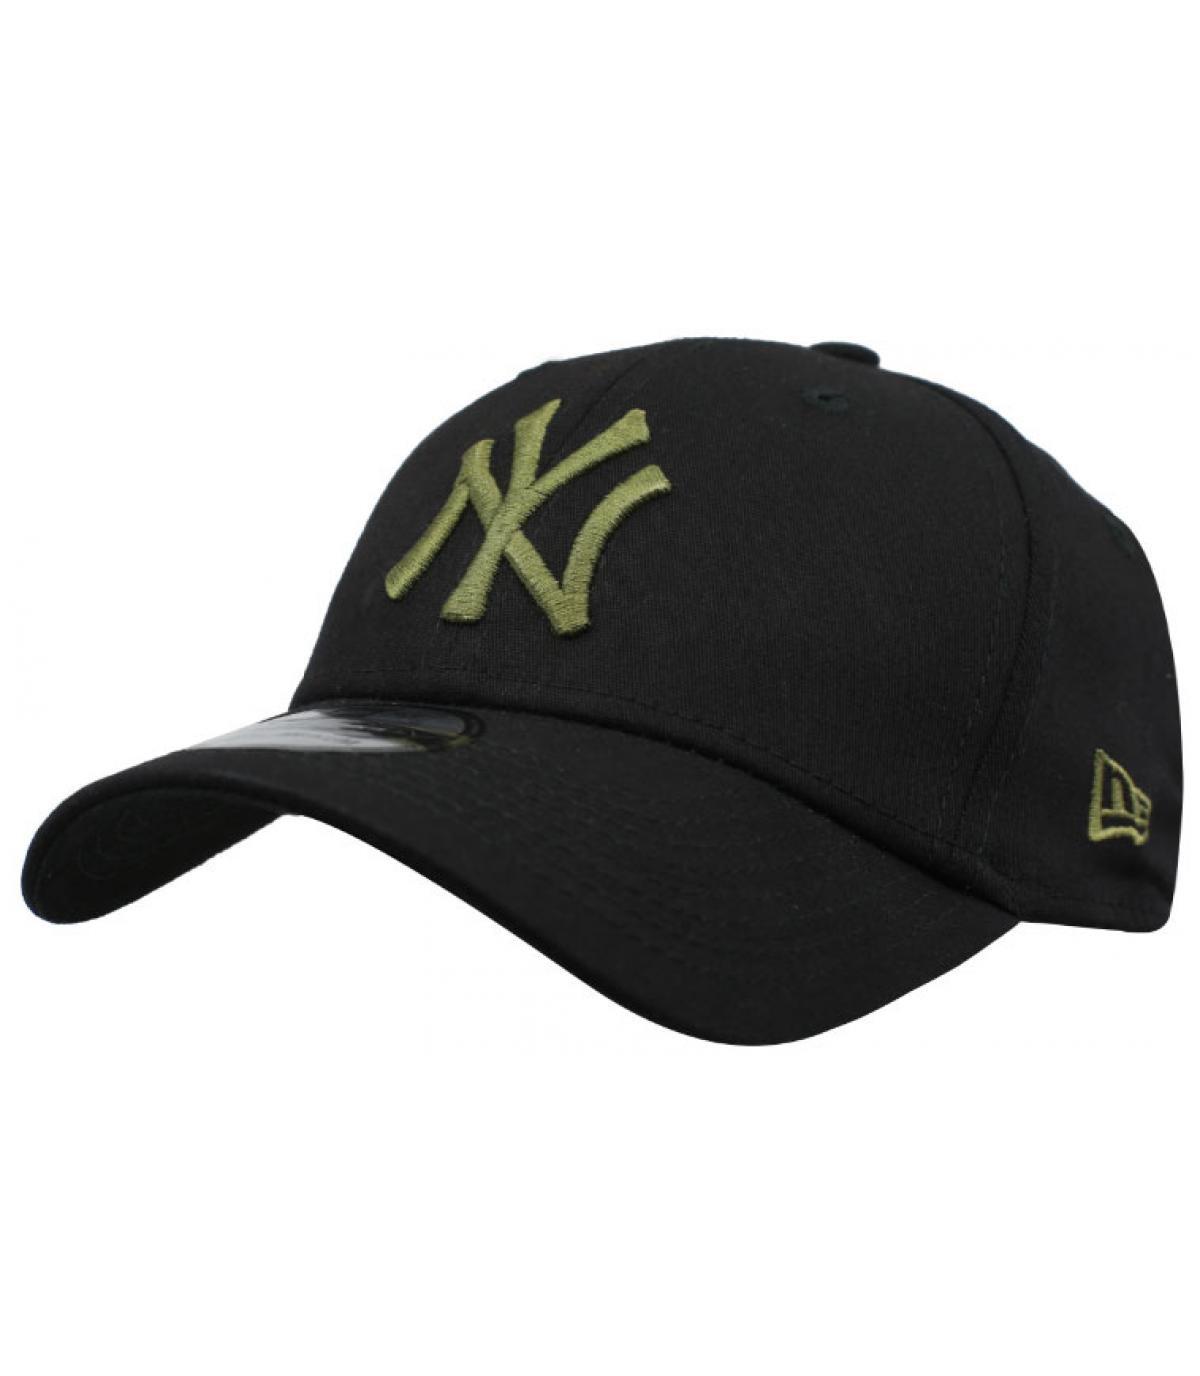 Details Cap League Ess NY 39Thirty black olive - Abbildung 2